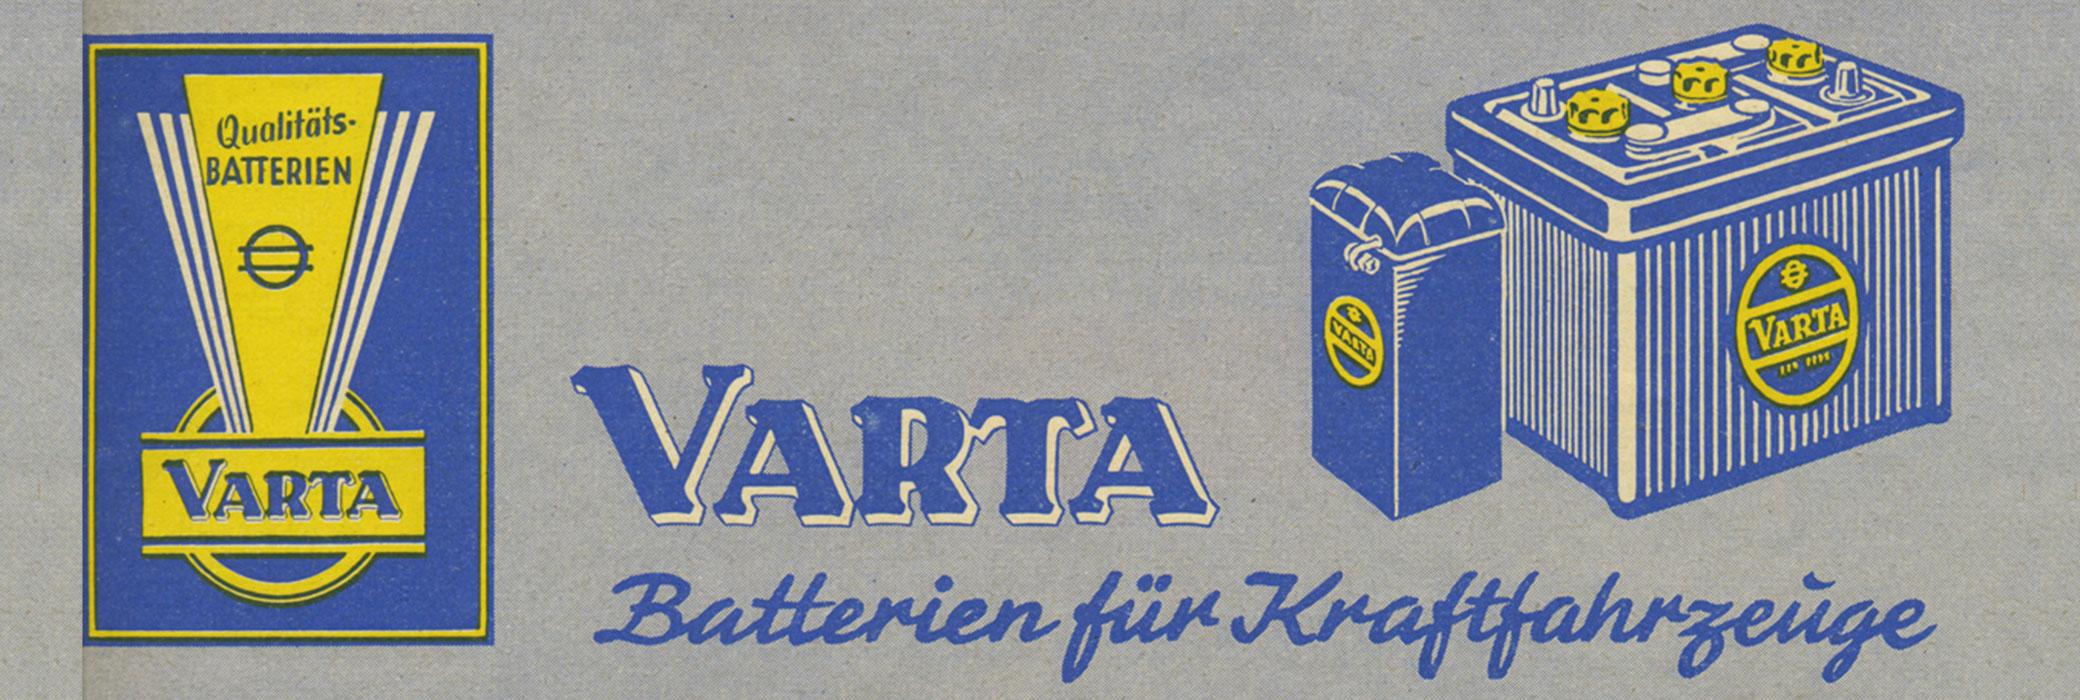 En gammel VARTA® reklame i gult og blåt